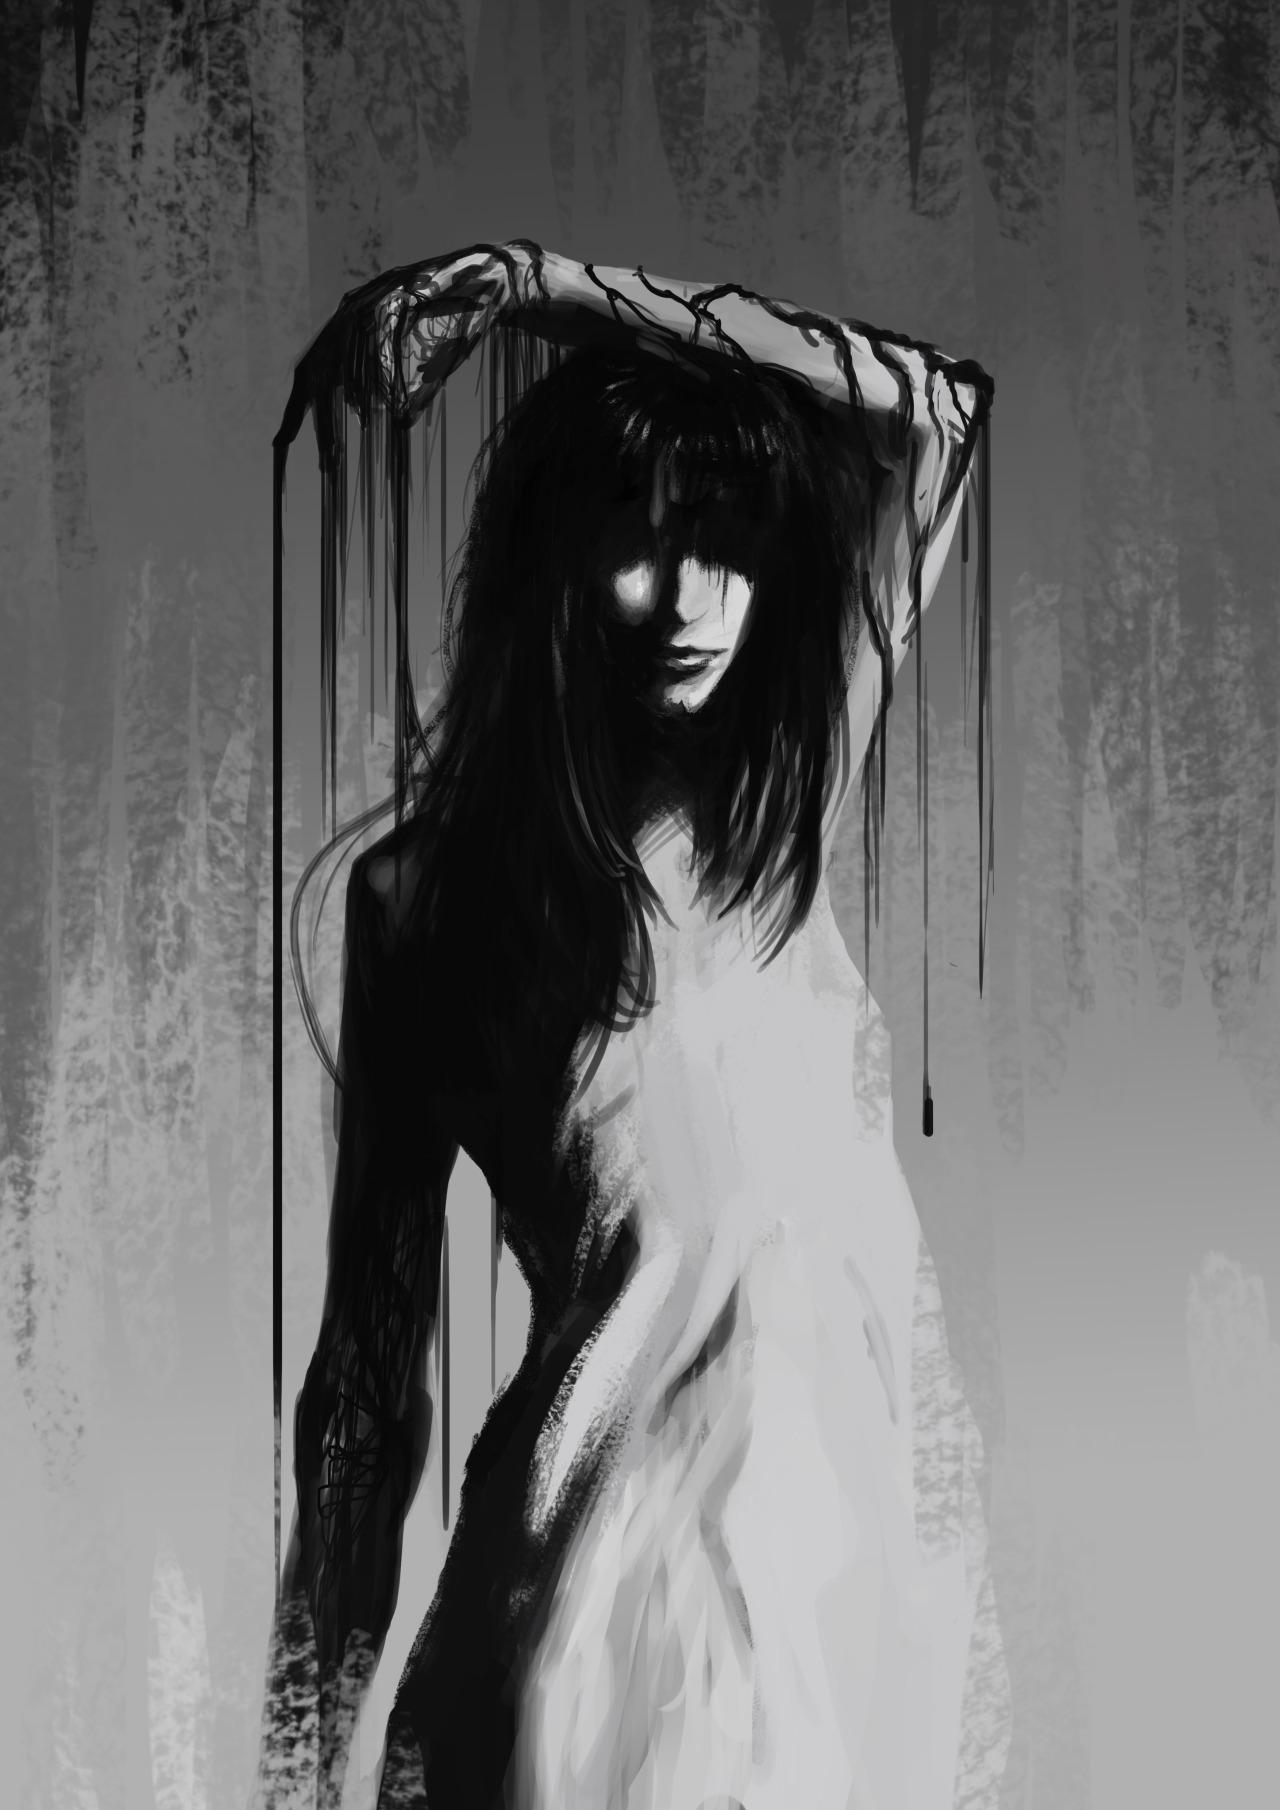 #spilledinkchallengeby Qiara Teor/BunnyBooPlease like my page if you like my art. :D https://www.facebook.com/bunnyboodoodleshttp://qiara23.deviantart.com/